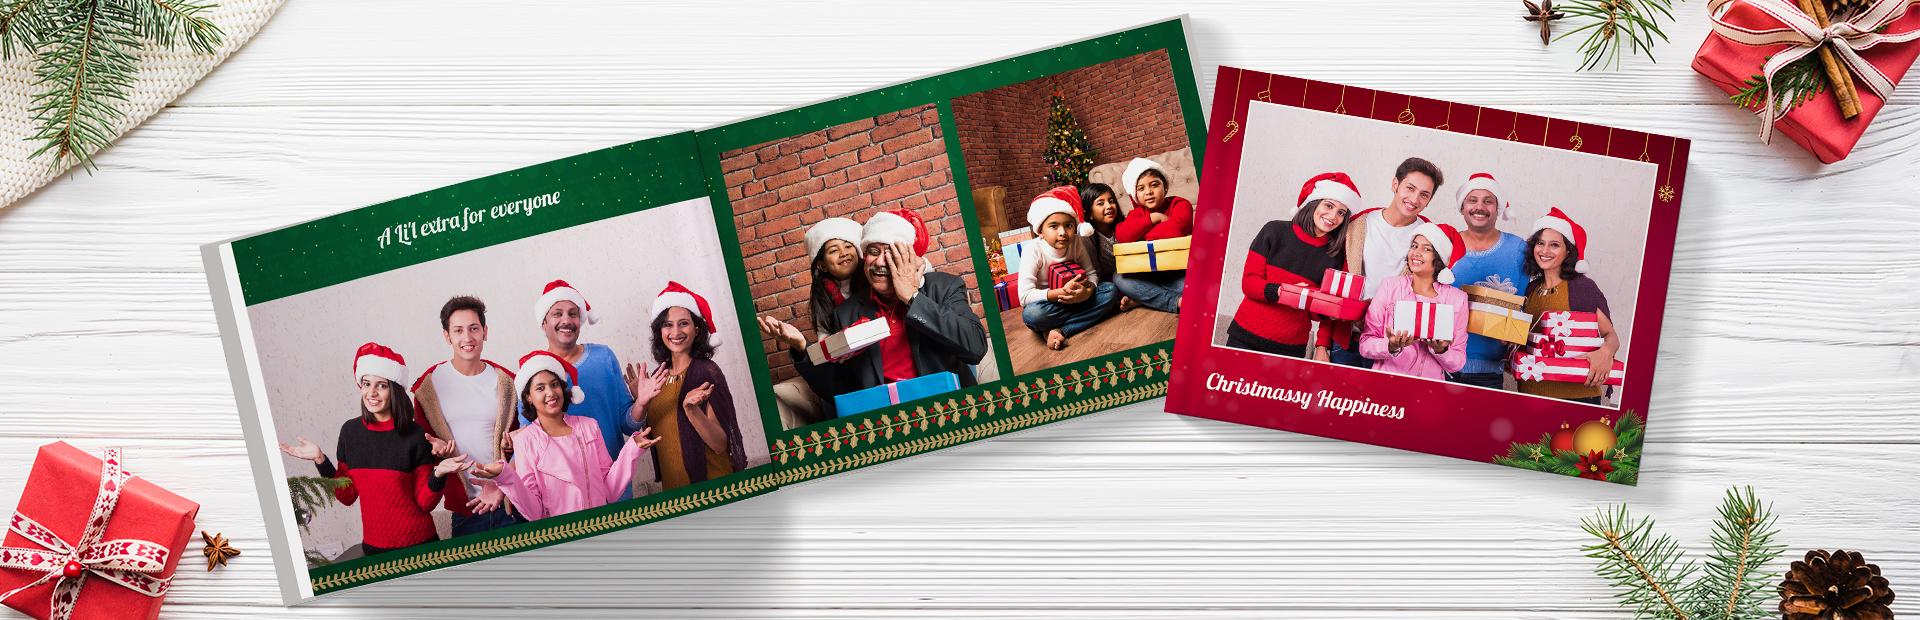 Merry Christmas Custom Photo Books